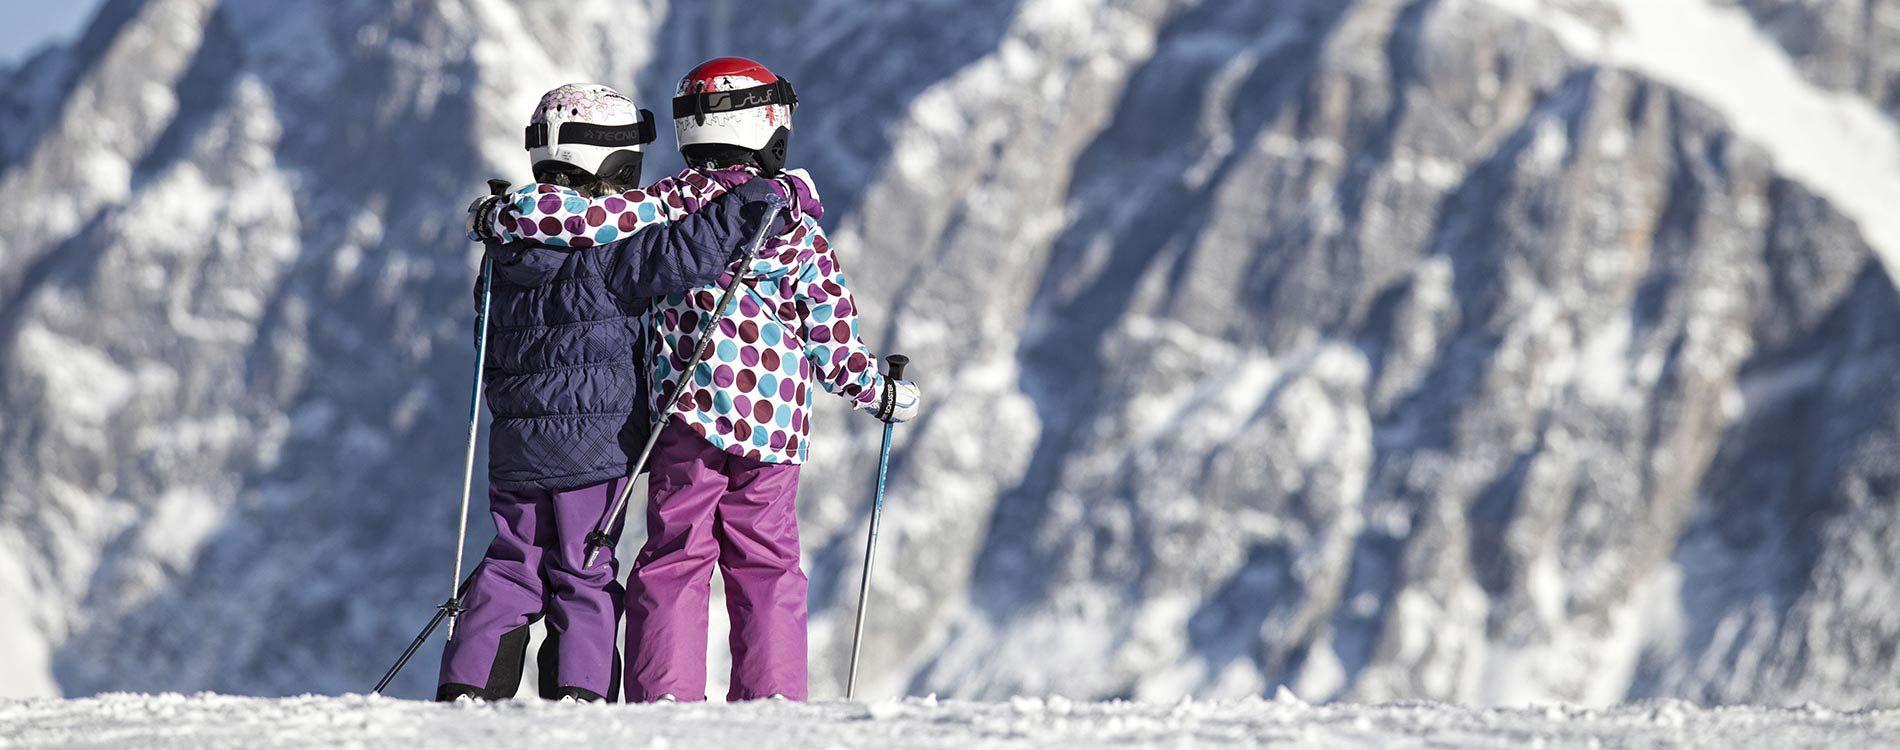 family skiing - family ski holiday - Singer Sporthotel & SPA Berwang Tyrol Austria - Niche Destinations